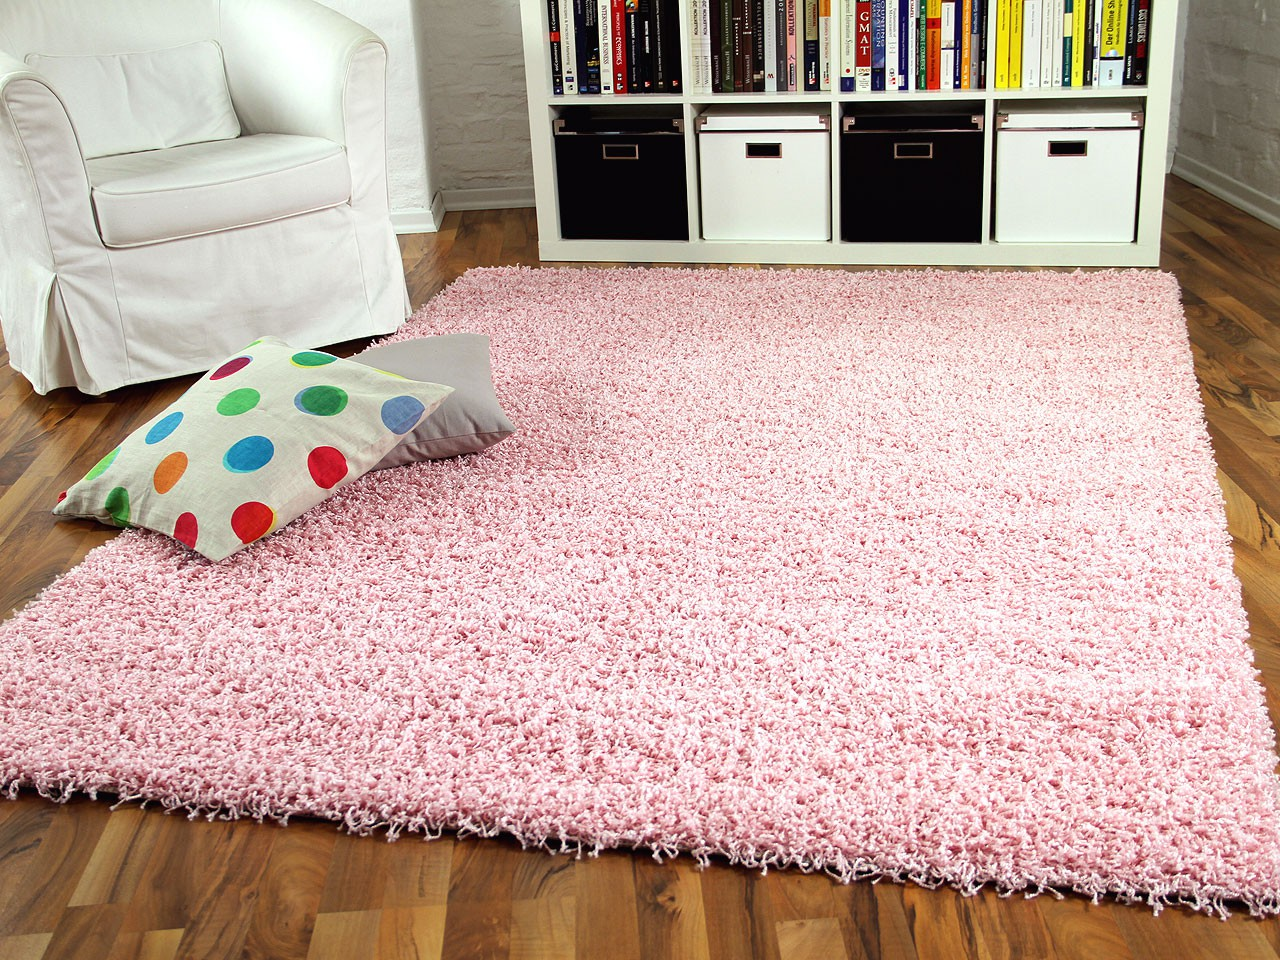 hochflor langflor shaggy teppich aloha rosa teppiche hochflor langflor teppiche pink lila und rosa. Black Bedroom Furniture Sets. Home Design Ideas